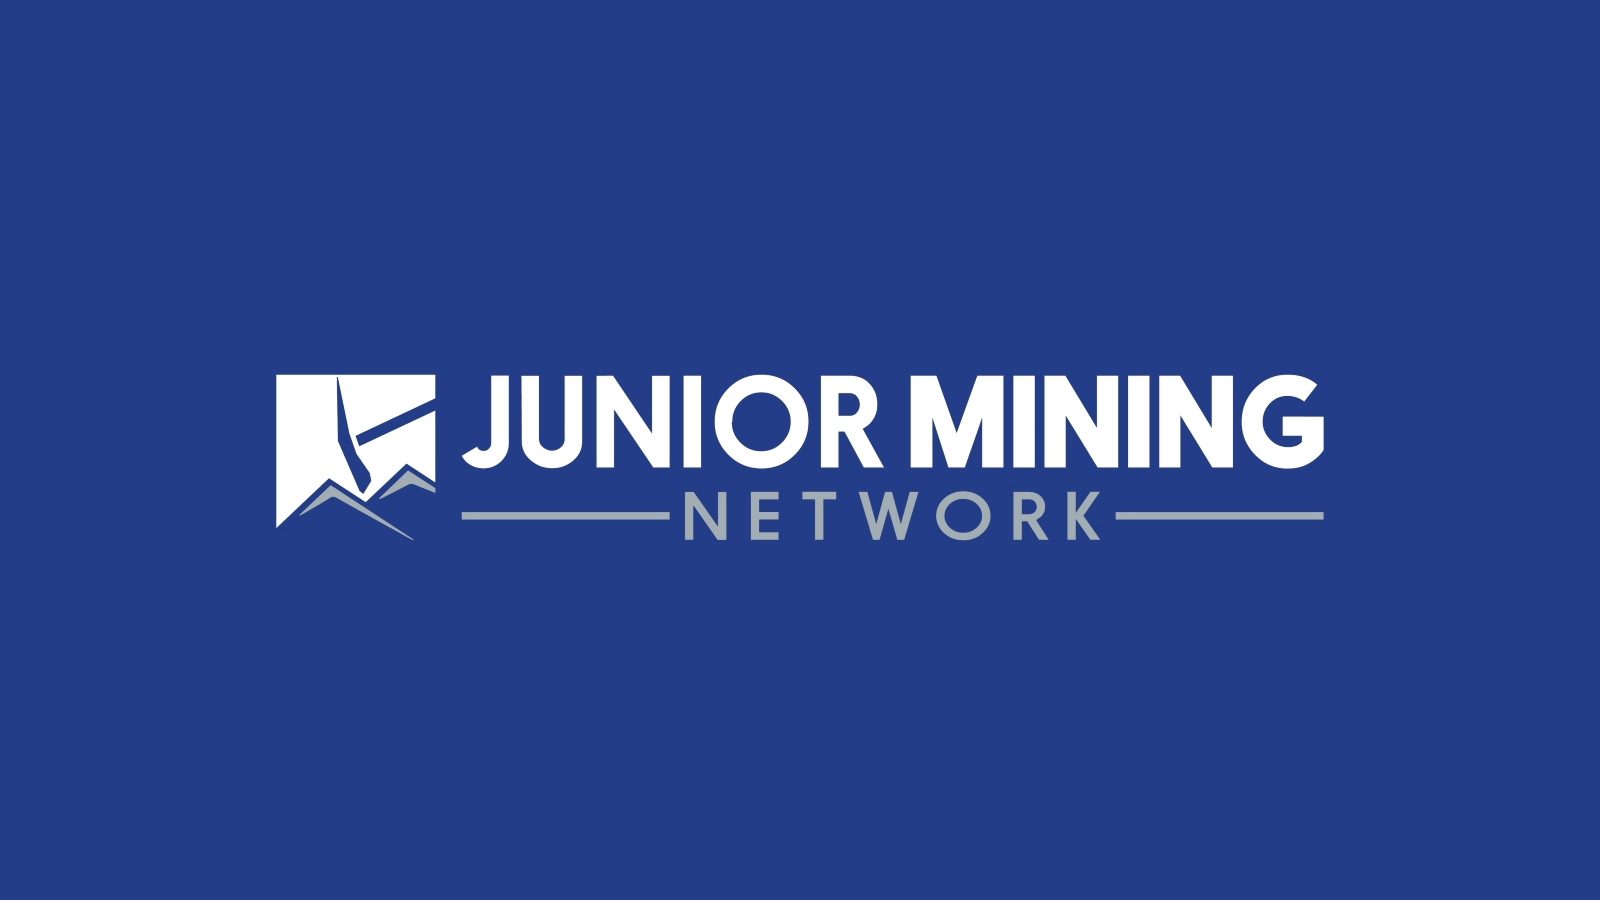 Vizsla Silver Announces Closing of C$69 Million Bought Deal Financing - Junior Mining Network